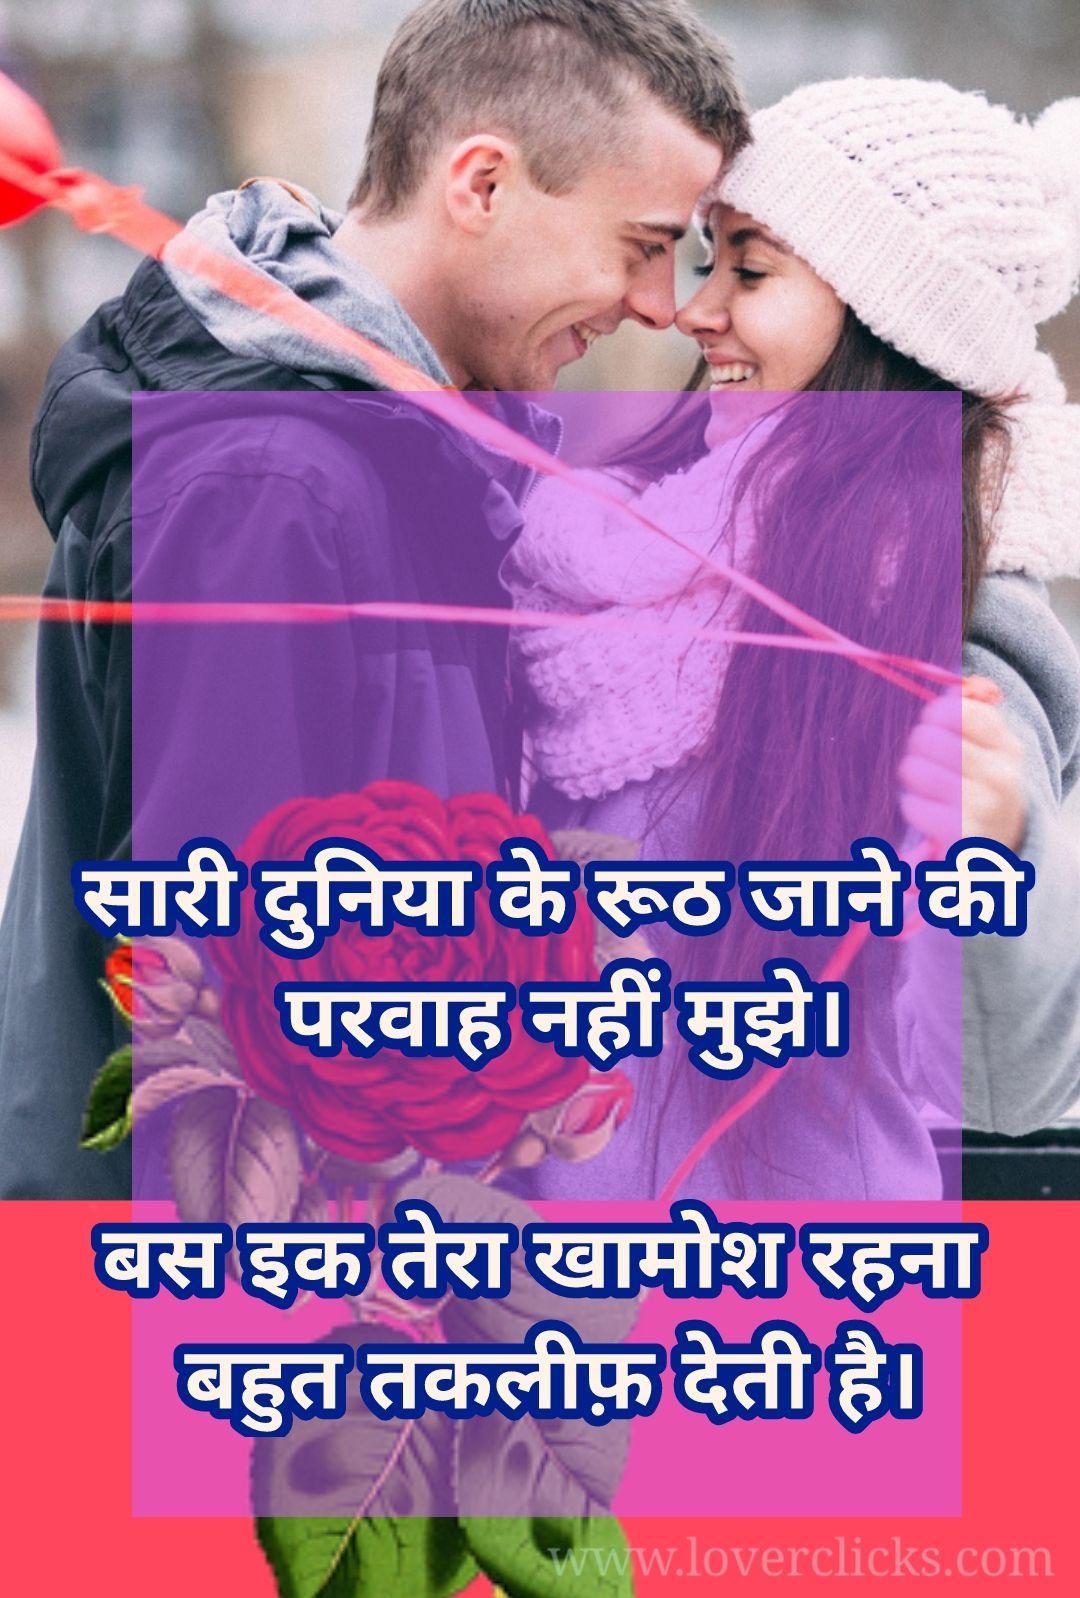 love shayari images for boyfriend